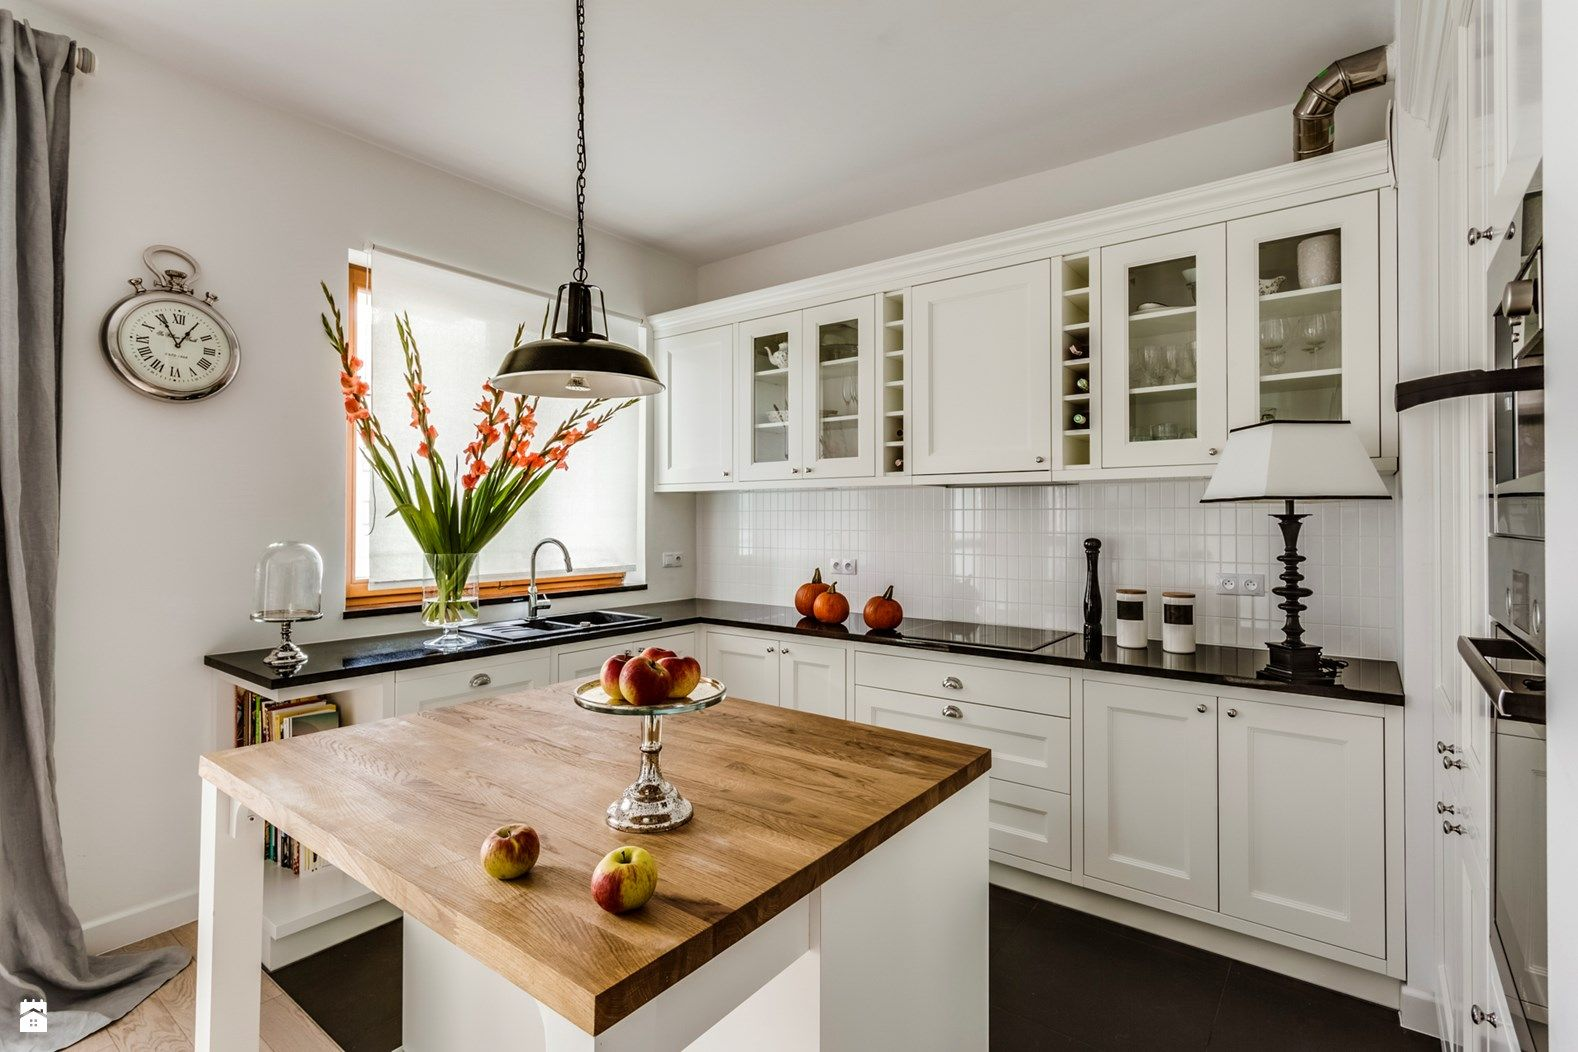 Kwstudio Scandinavian Kitchen Design Kitchen Design White Kitchen Design